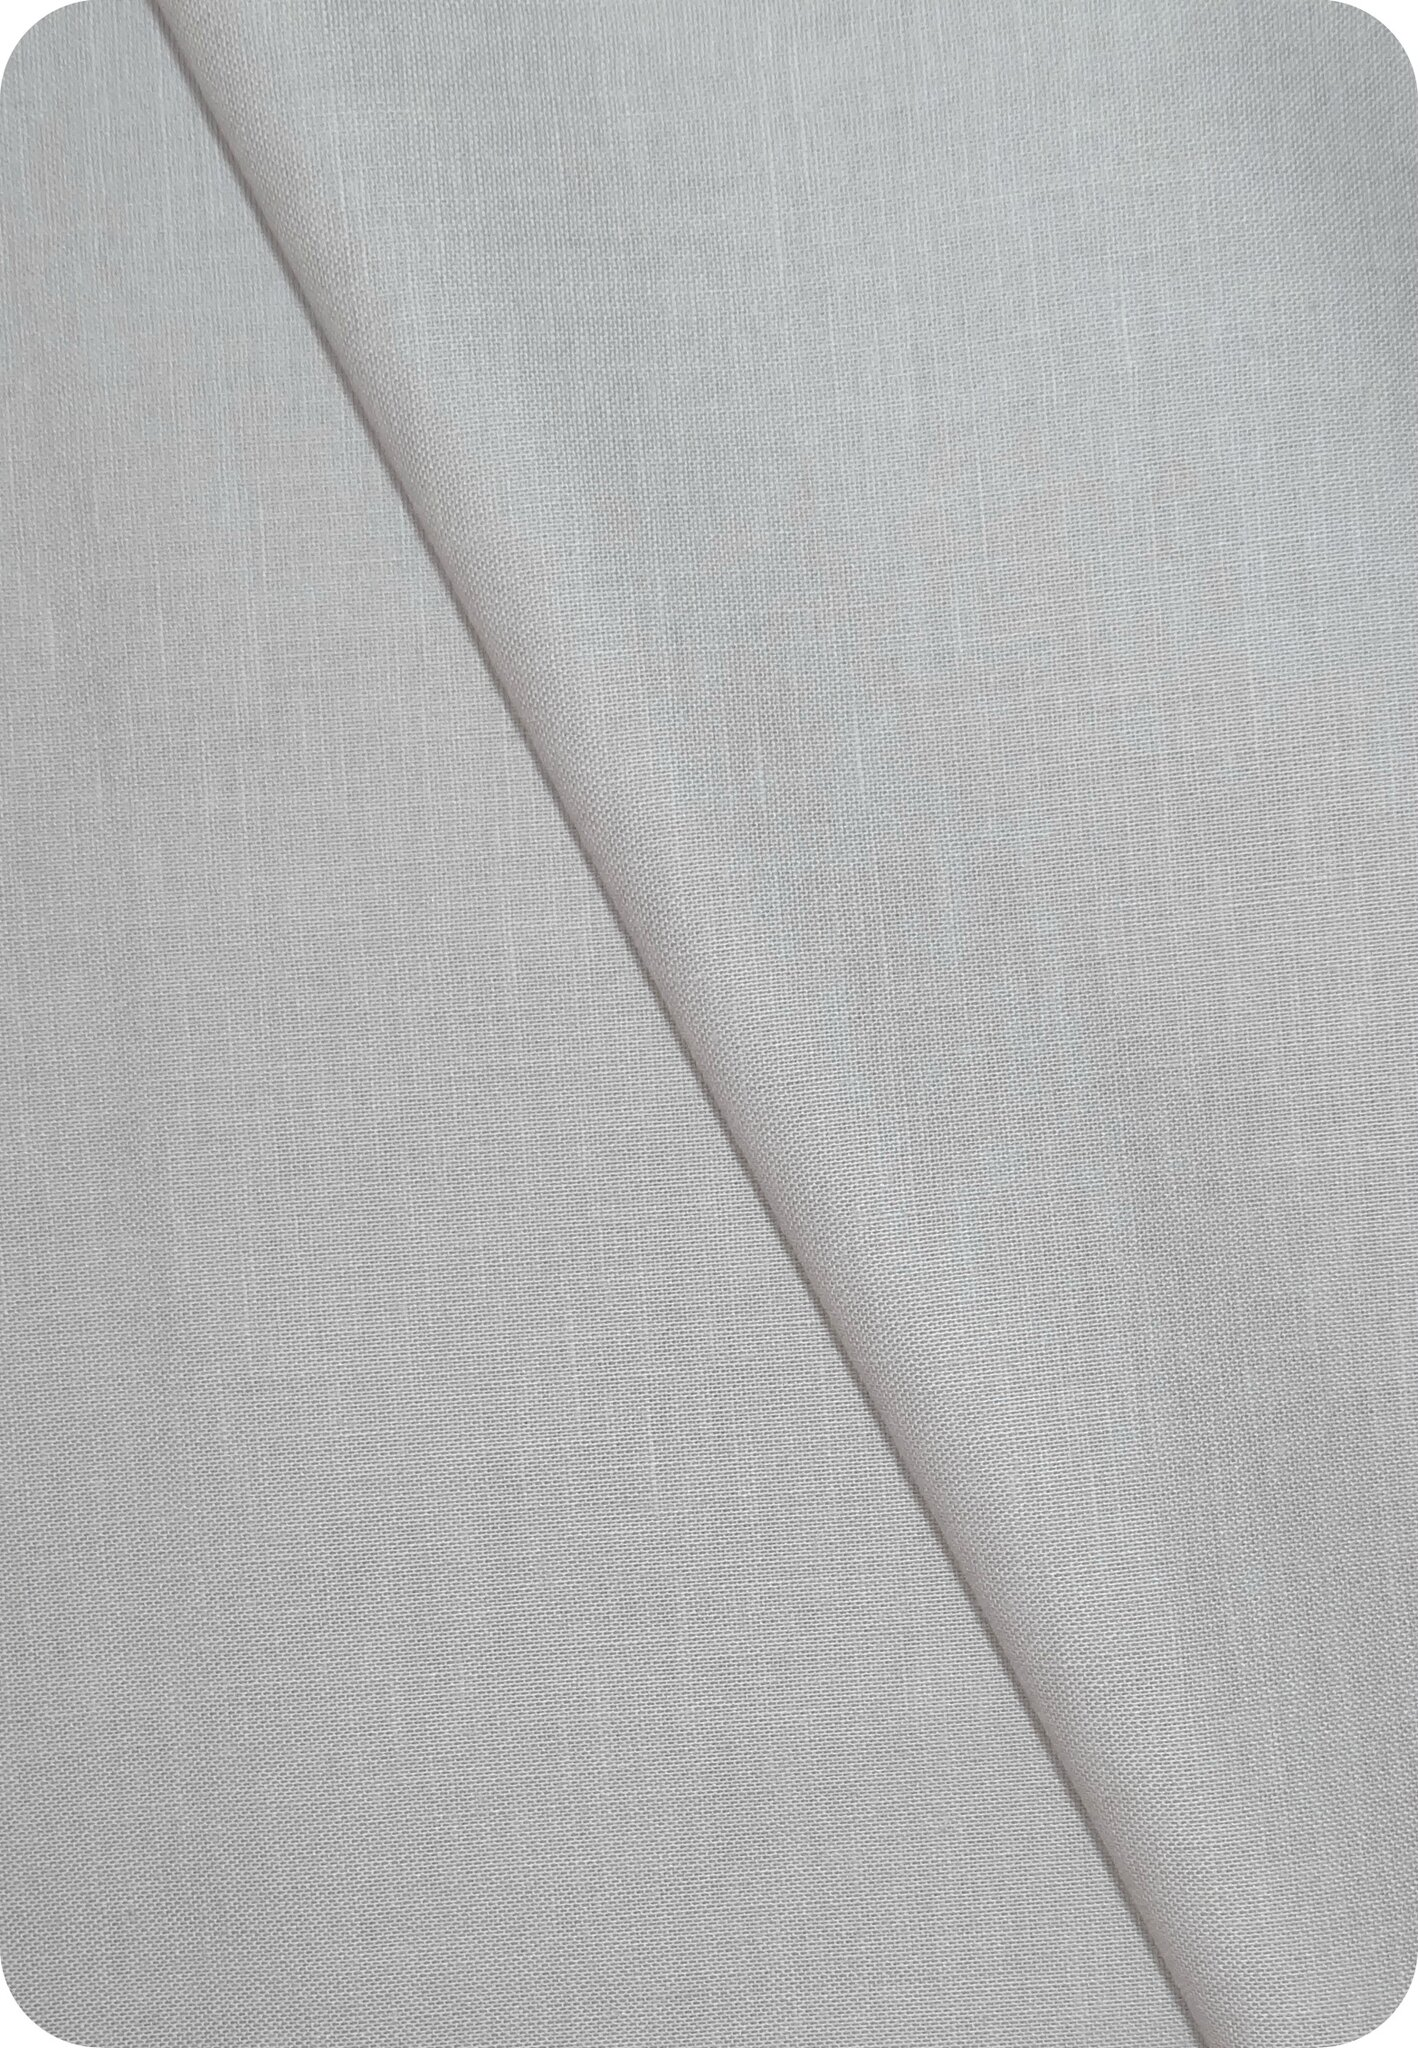 Tissu coton gris clair